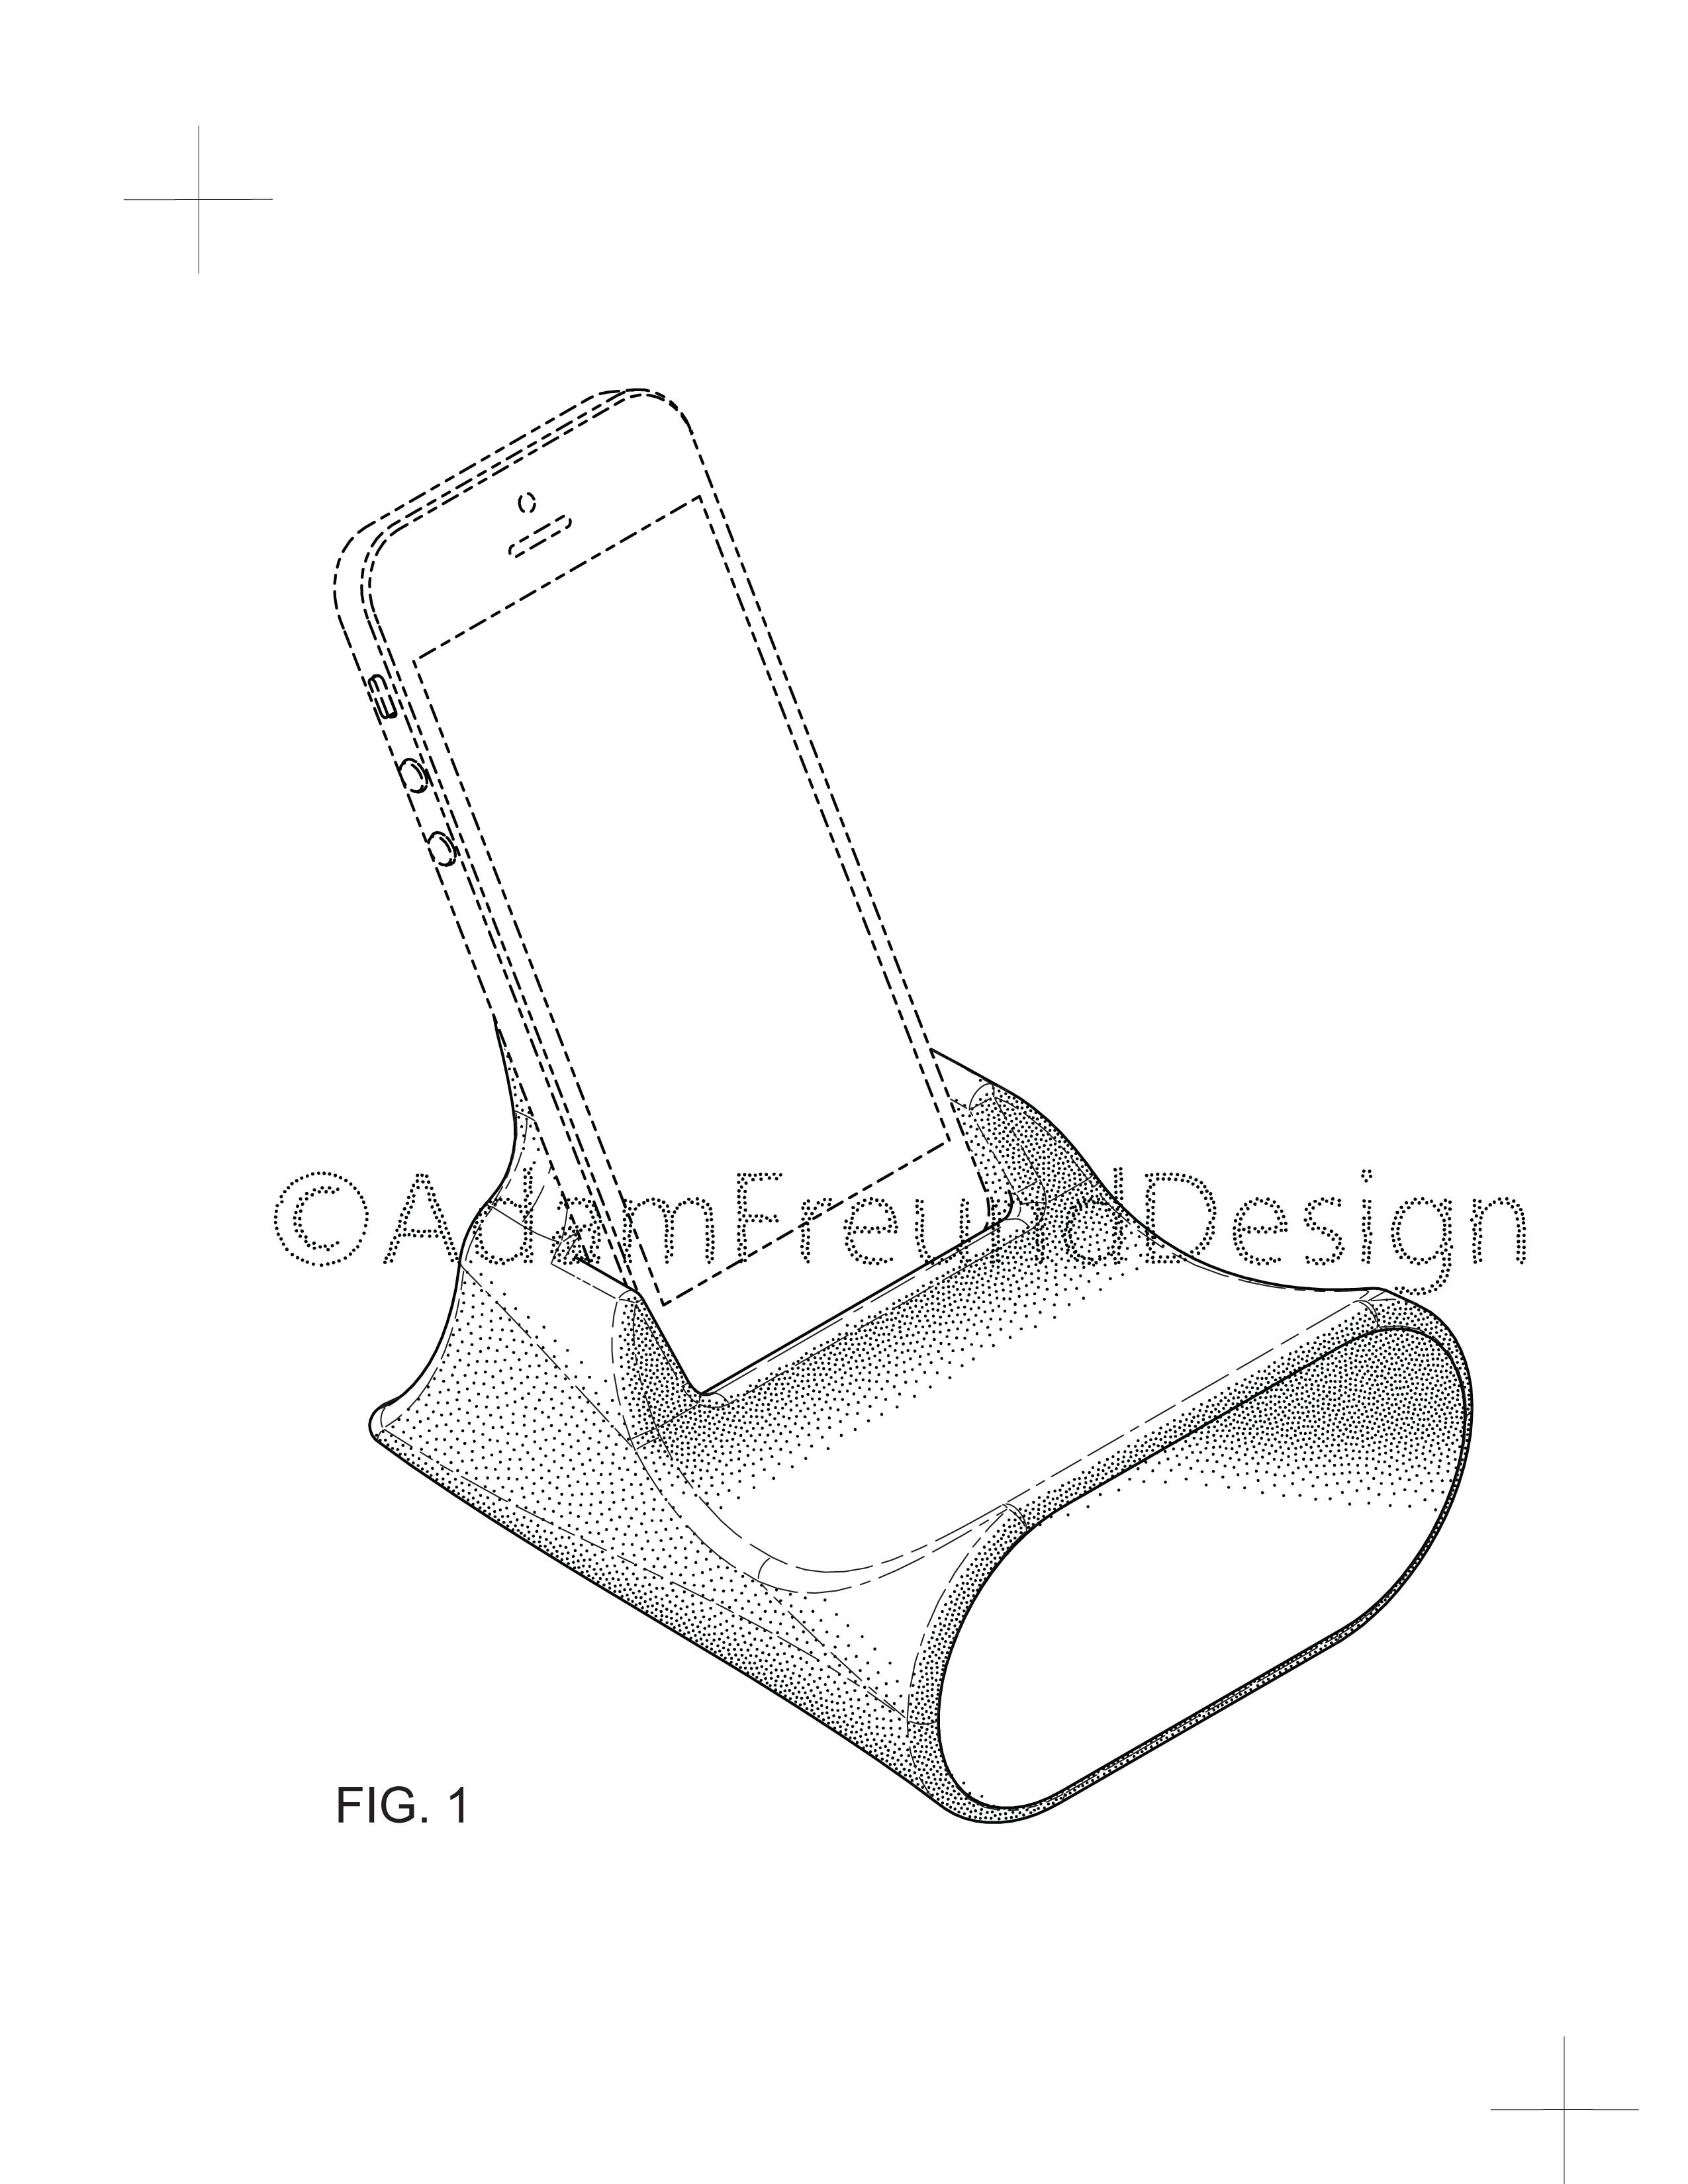 2550x3300 Patent Drawings By Adam Freund On Guru